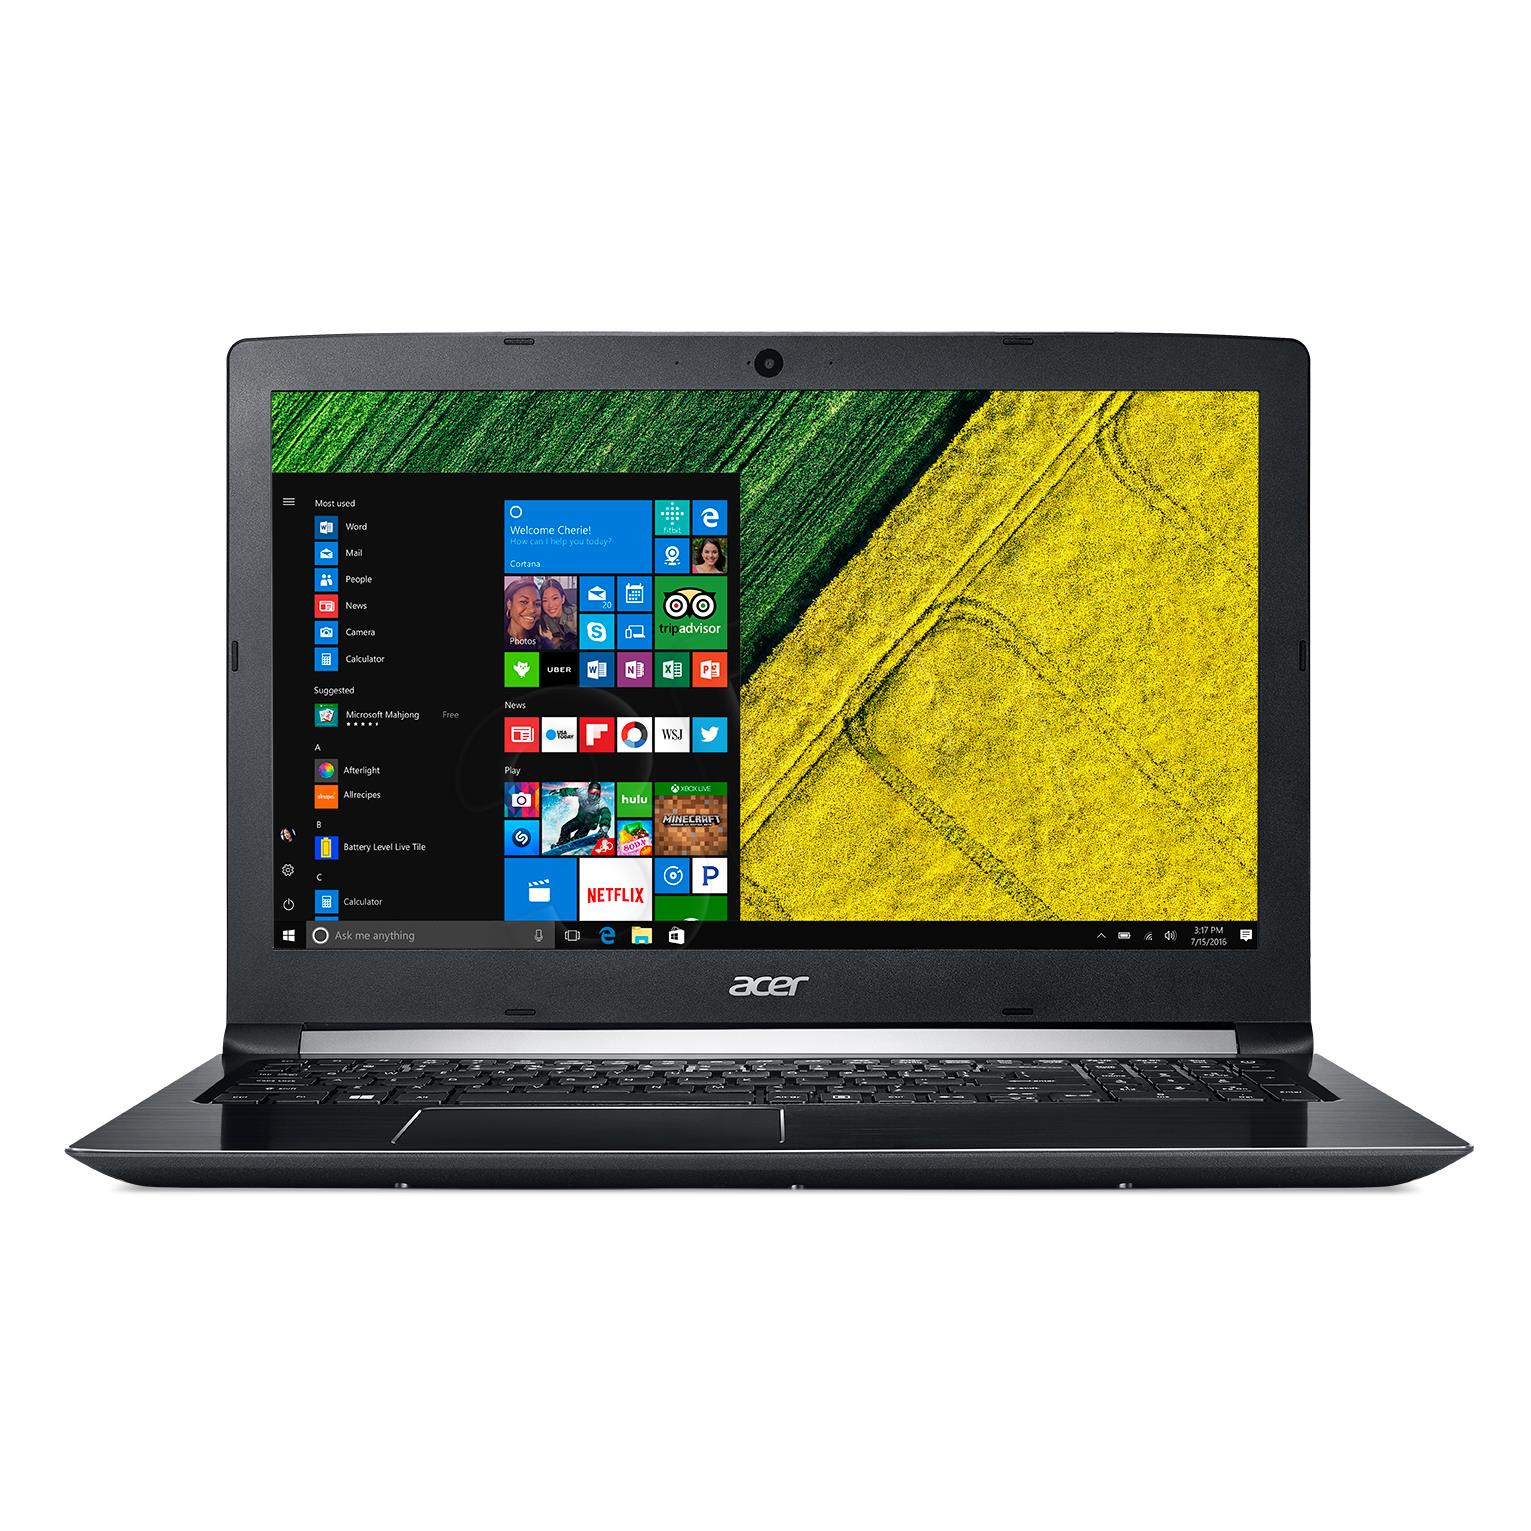 A515-51-75UY REPACK Windows 10 i7-7500U/8GB/1T/Intel HD 620/15.6''FHD Portatīvais dators